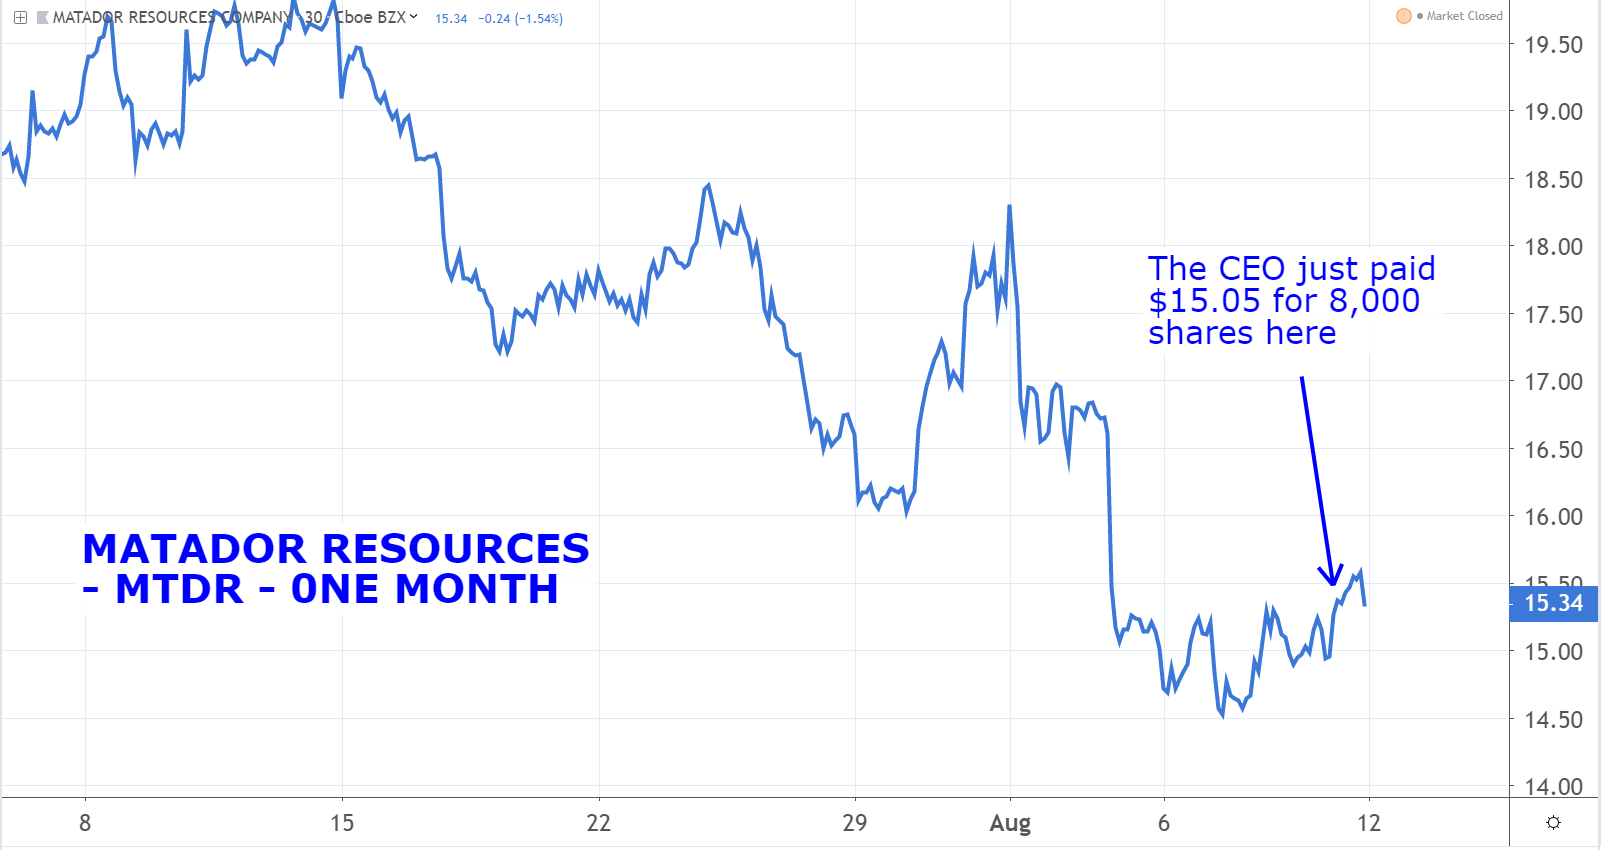 Stocks to Buy: Matador Resources (MTDR)